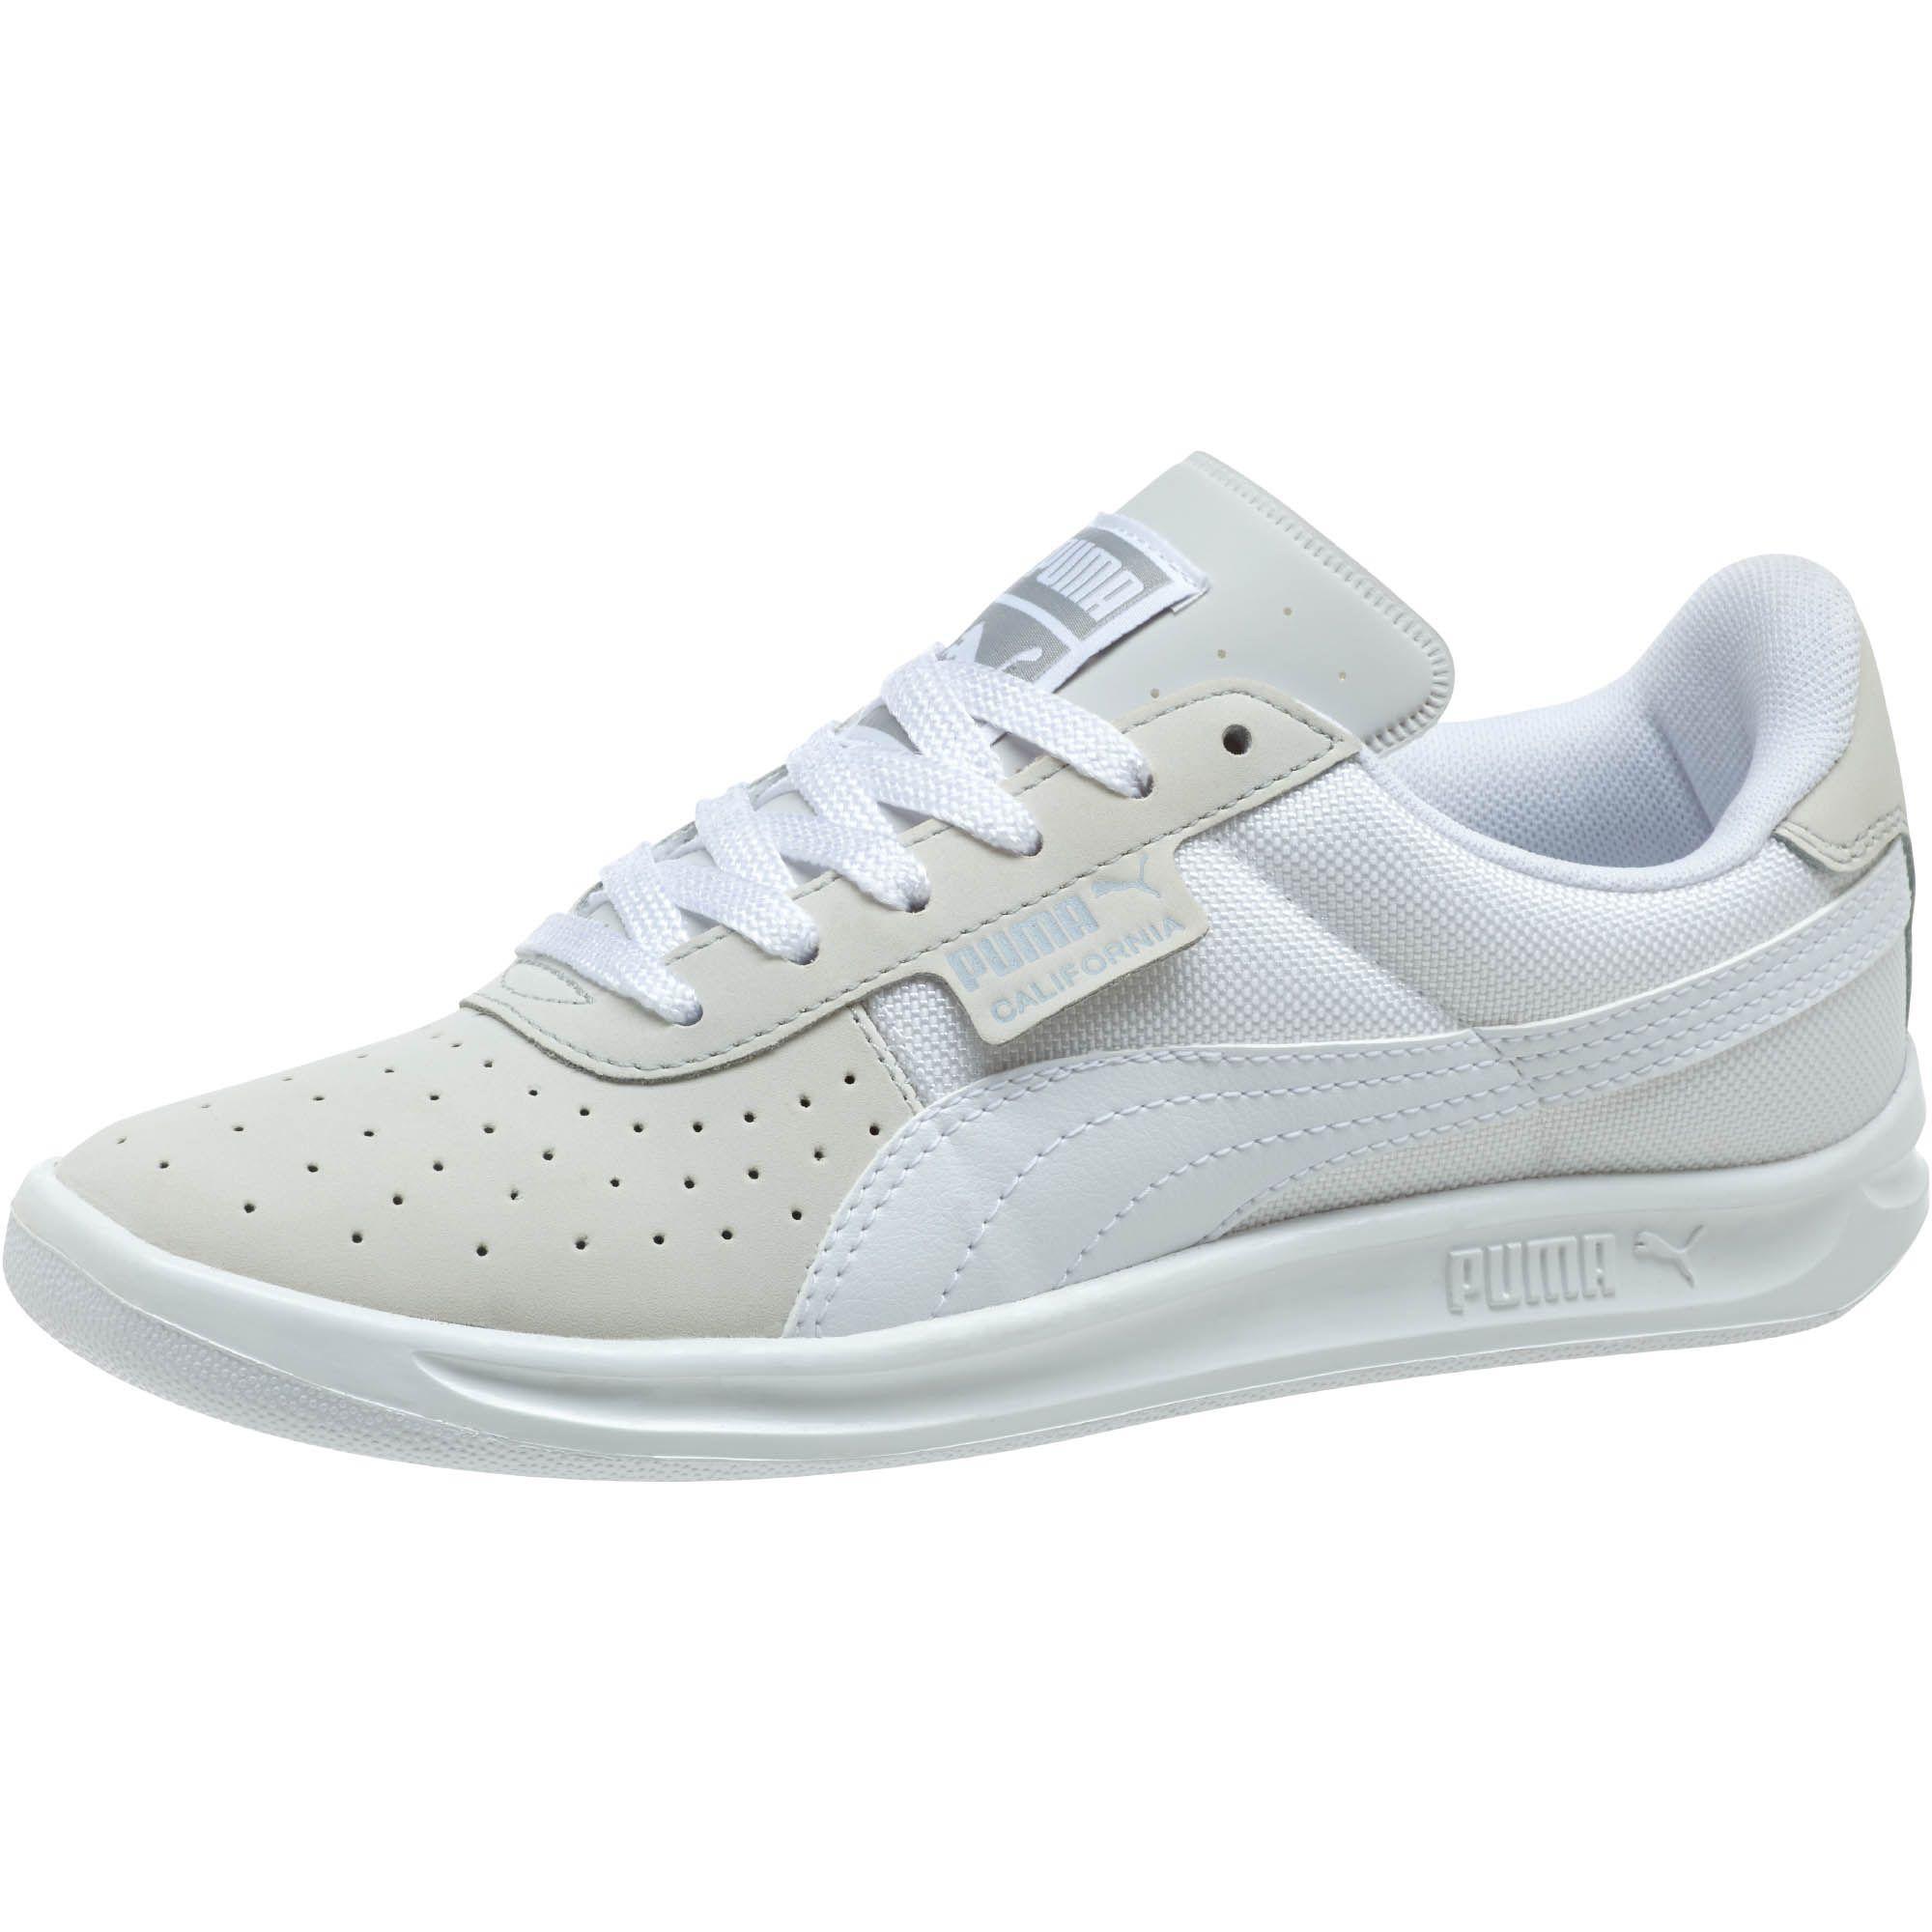 Lyst Puma California 2 Women S Sneakers In White